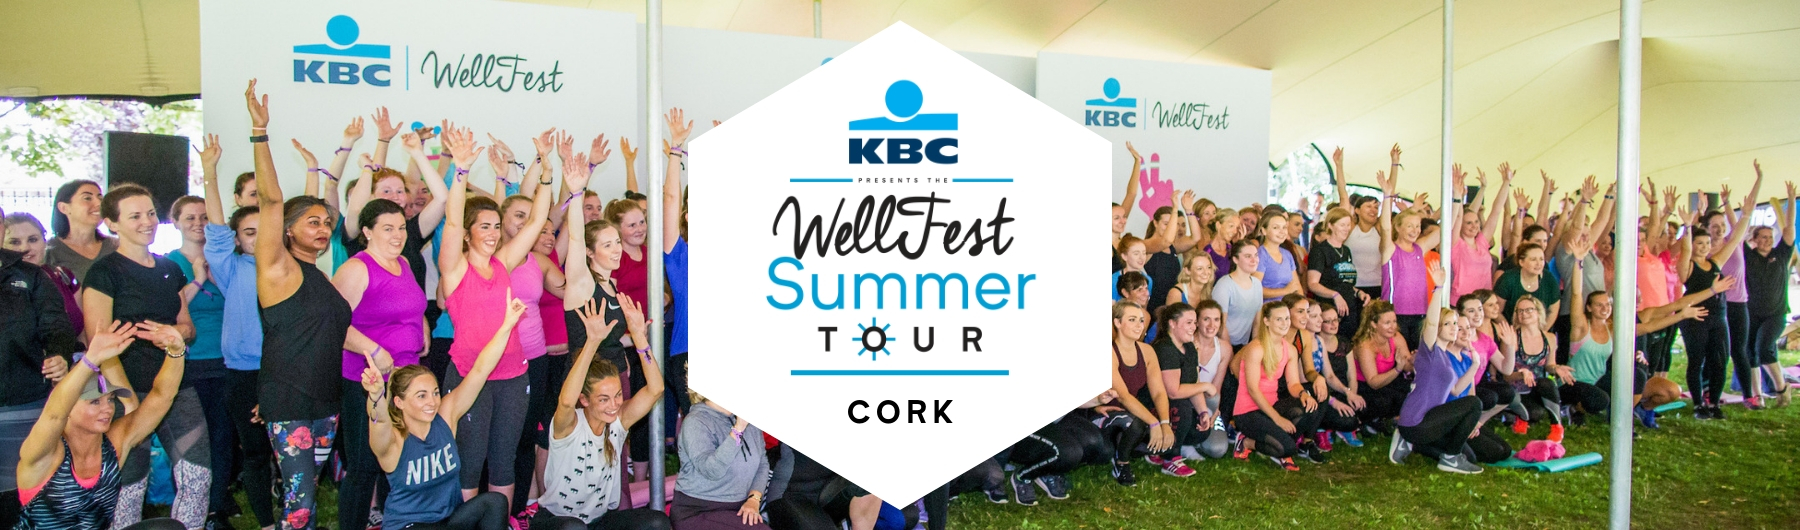 Cork - KBC presents the WellFest Summer Tour